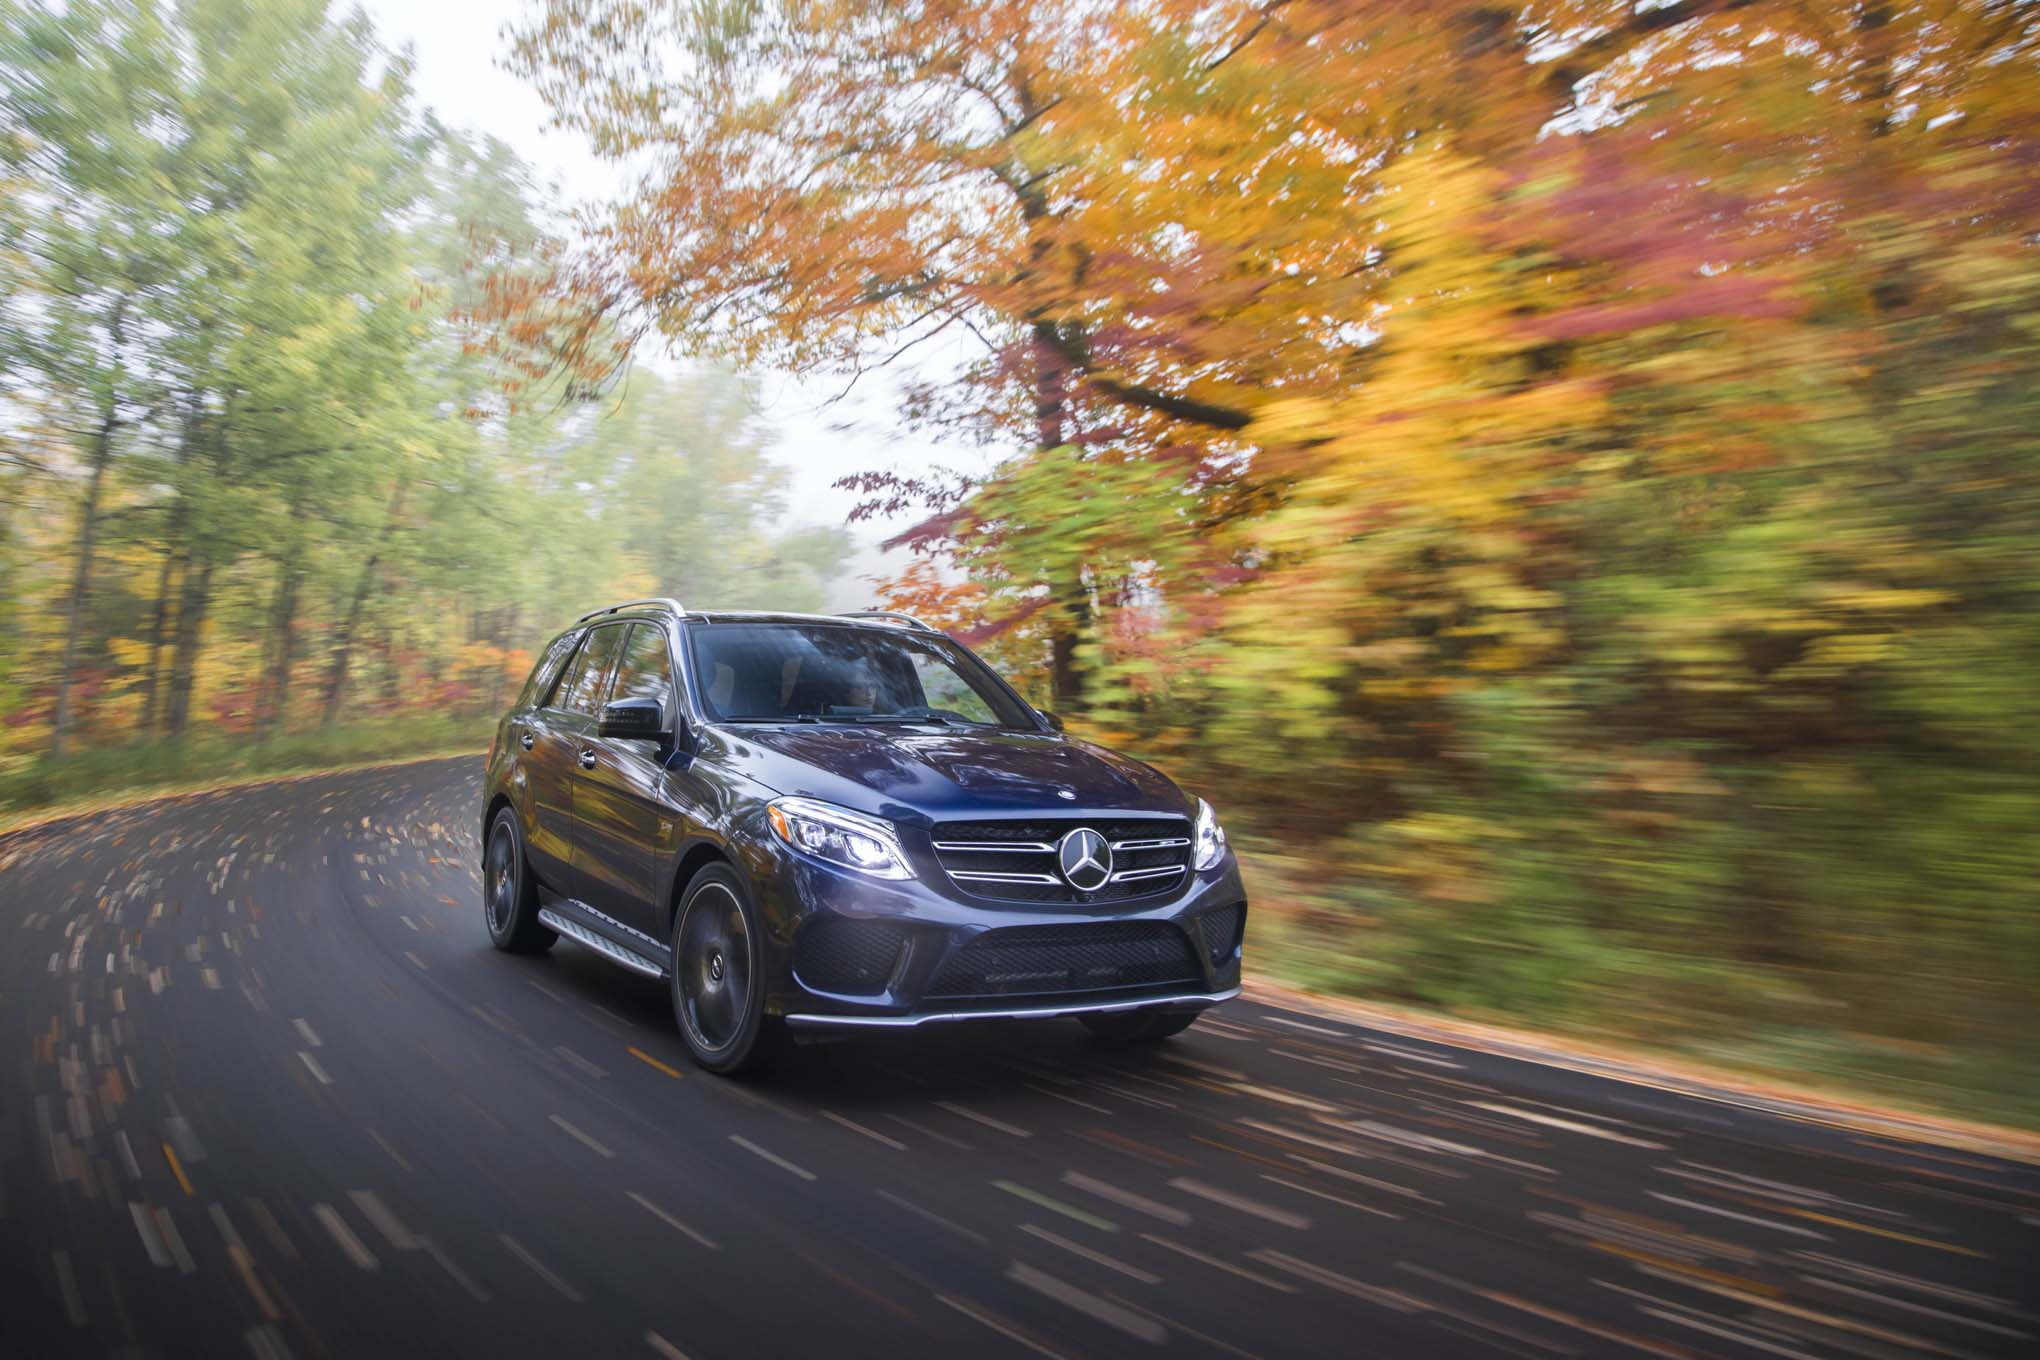 http://st.automobilemag.com/uploads/sites/11/2016/11/2017-Mercedes-AMG-GLE43-front-three-quarter-turn.jpg